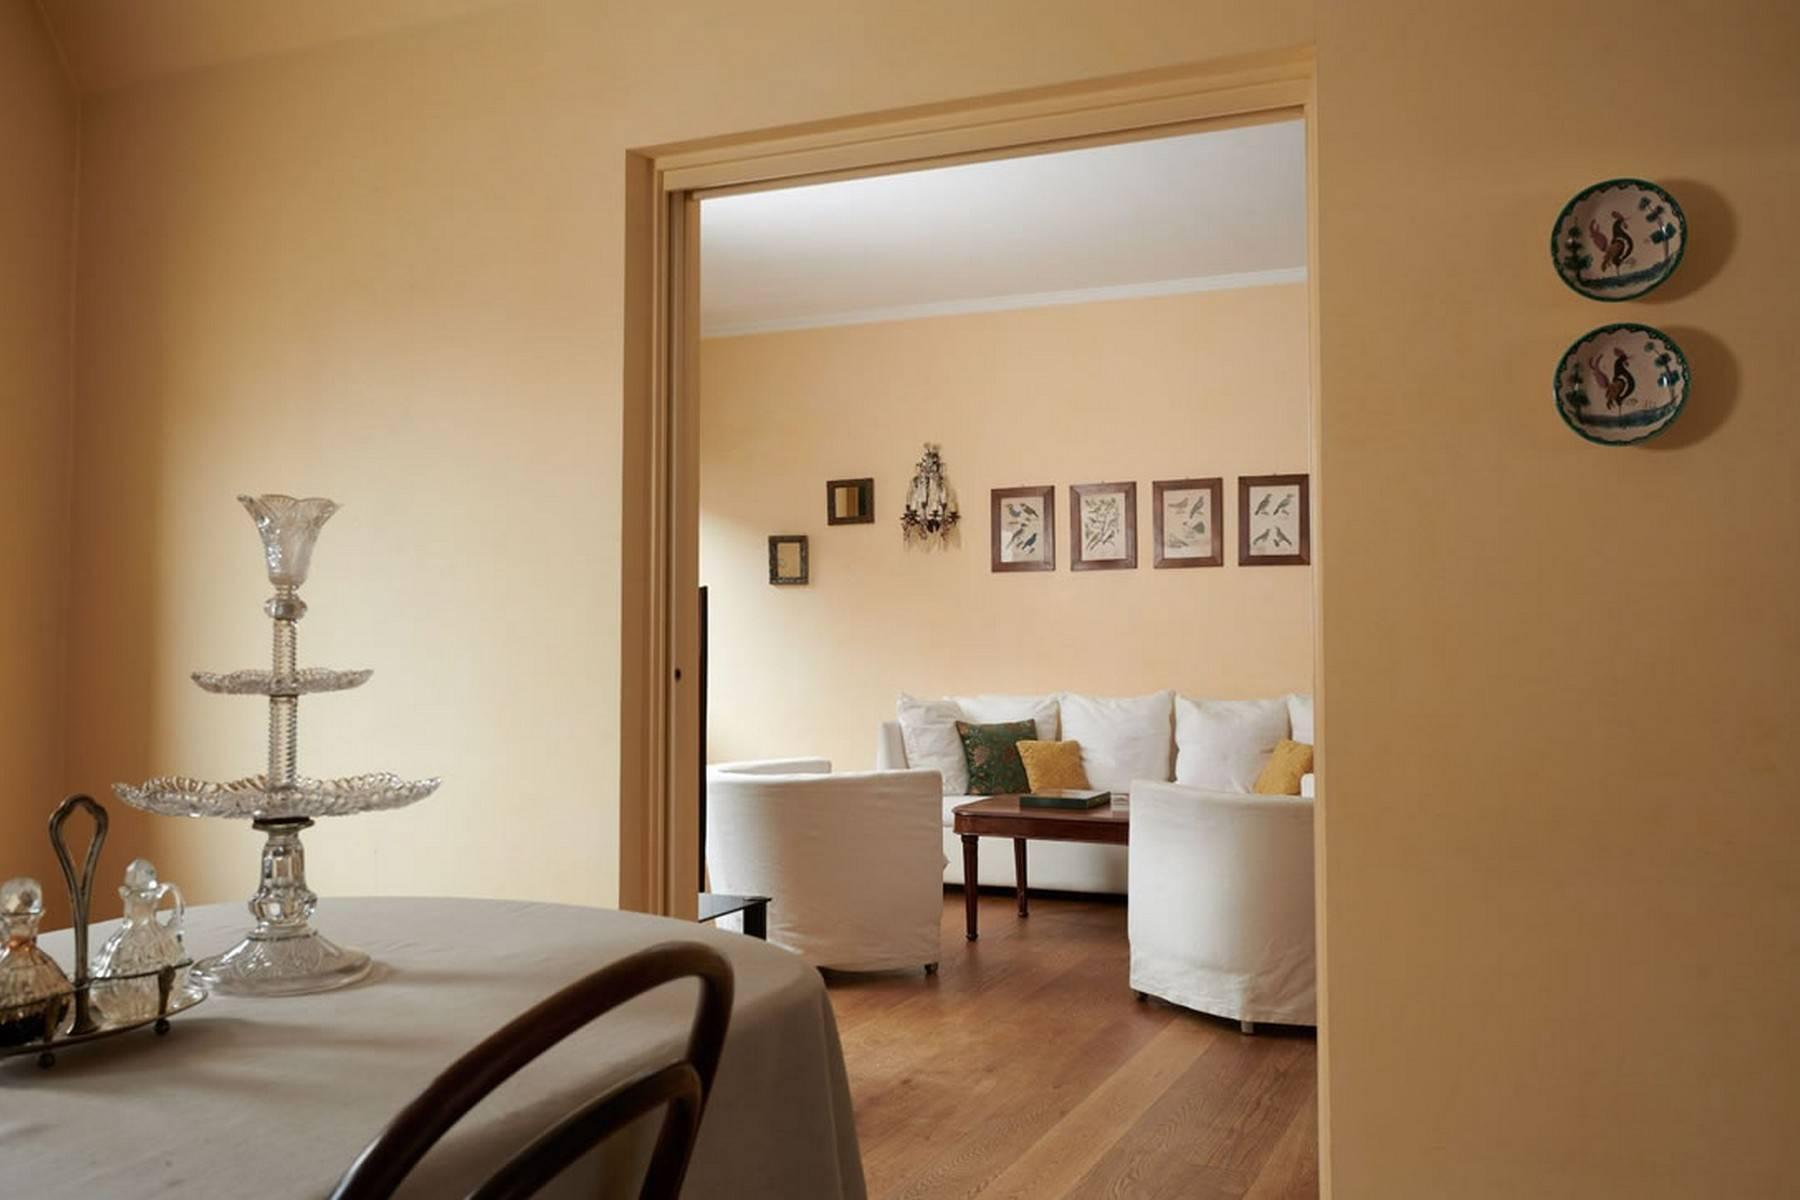 Appartement de design dans le Palazzo Querini Stampalia / S.M. Formosa - 13